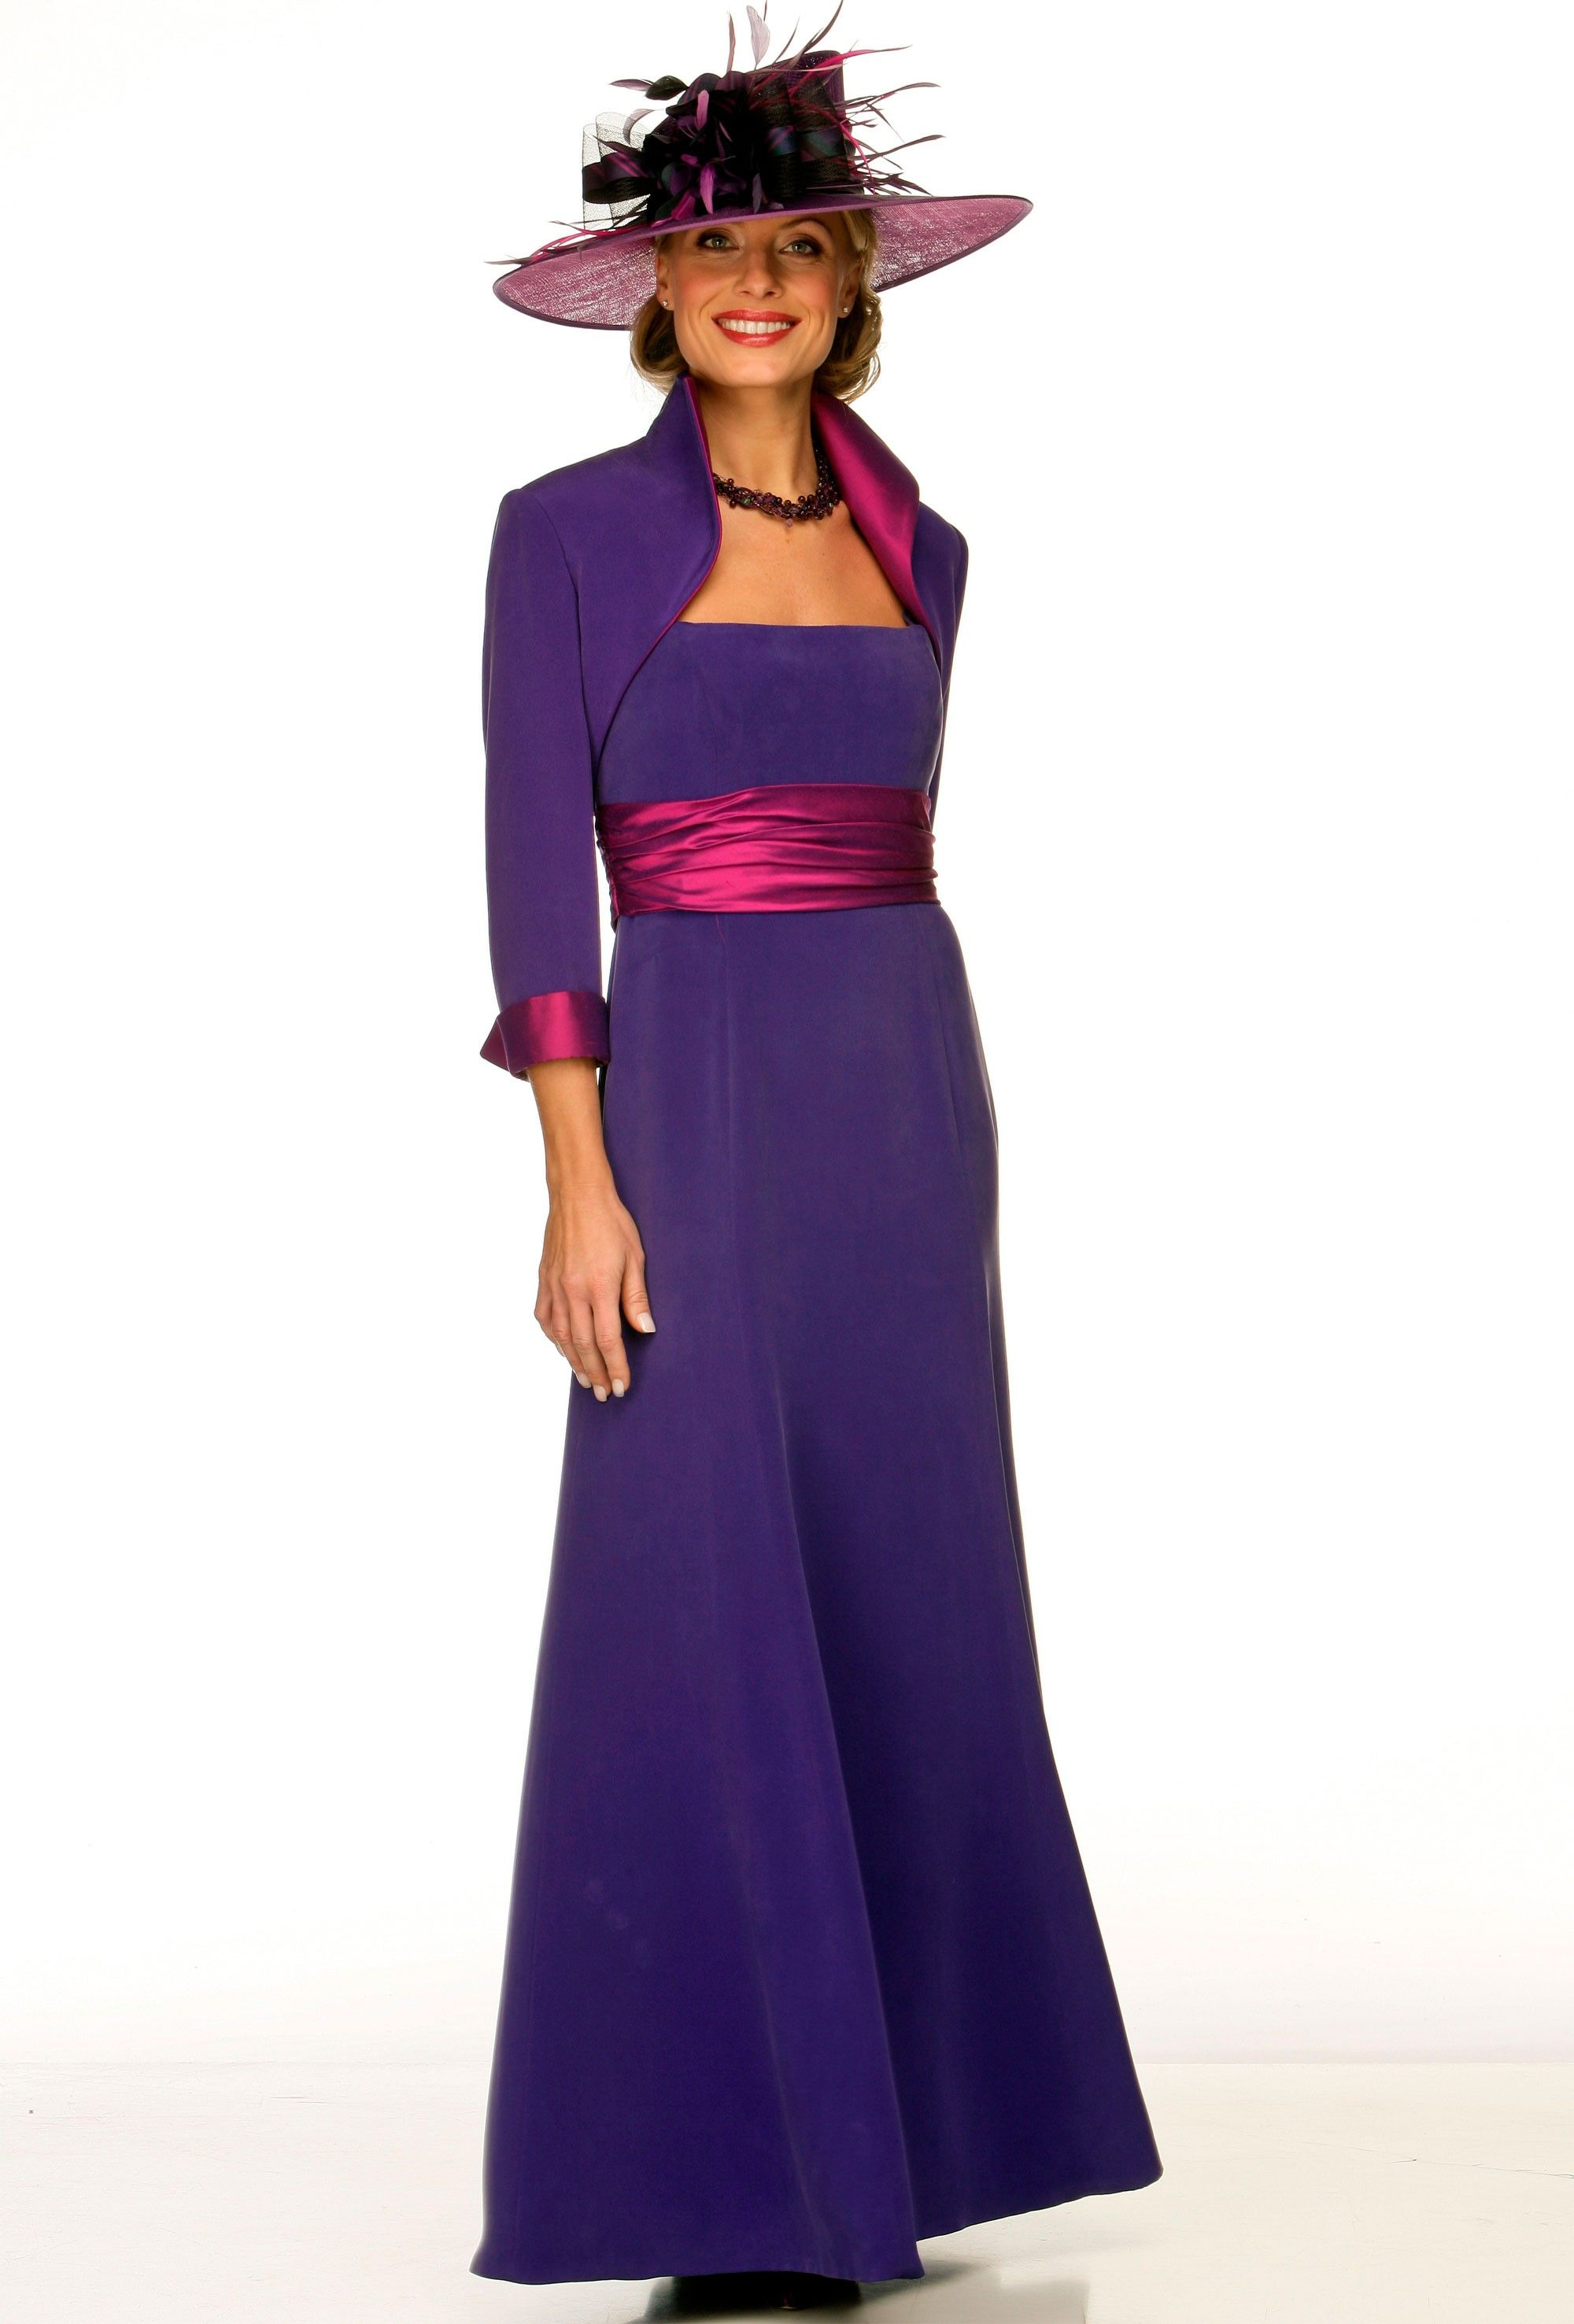 Joyce Young Silk dress and bolero jacket - Wedding Dresses ...